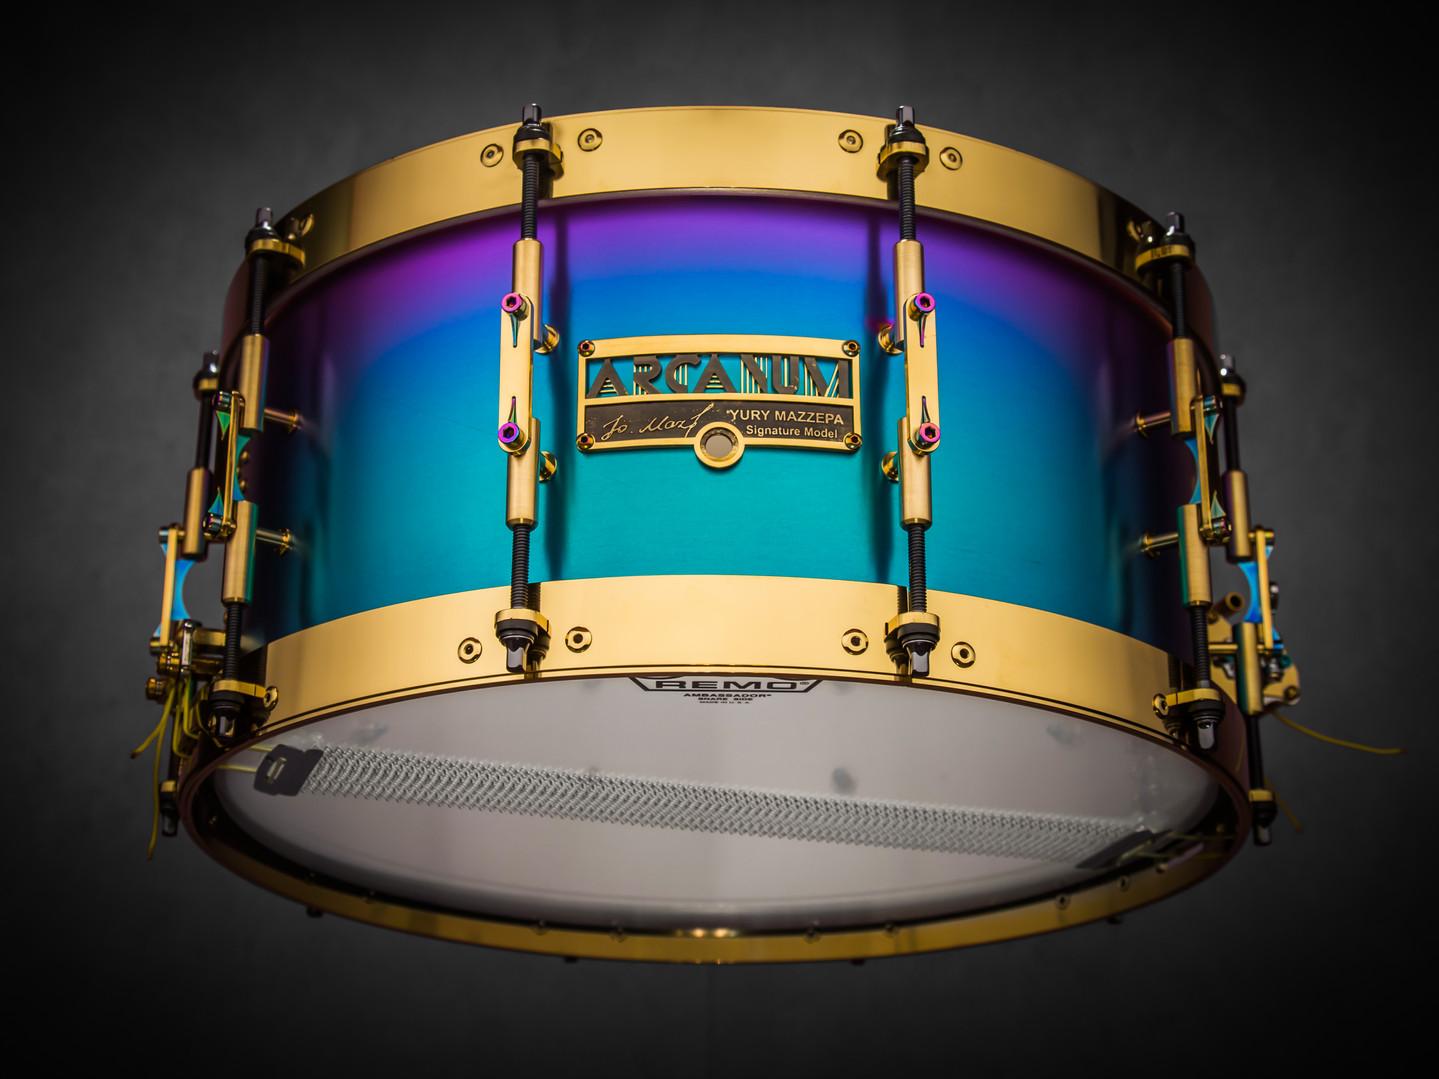 Yury Mazzepa Signature snare drum